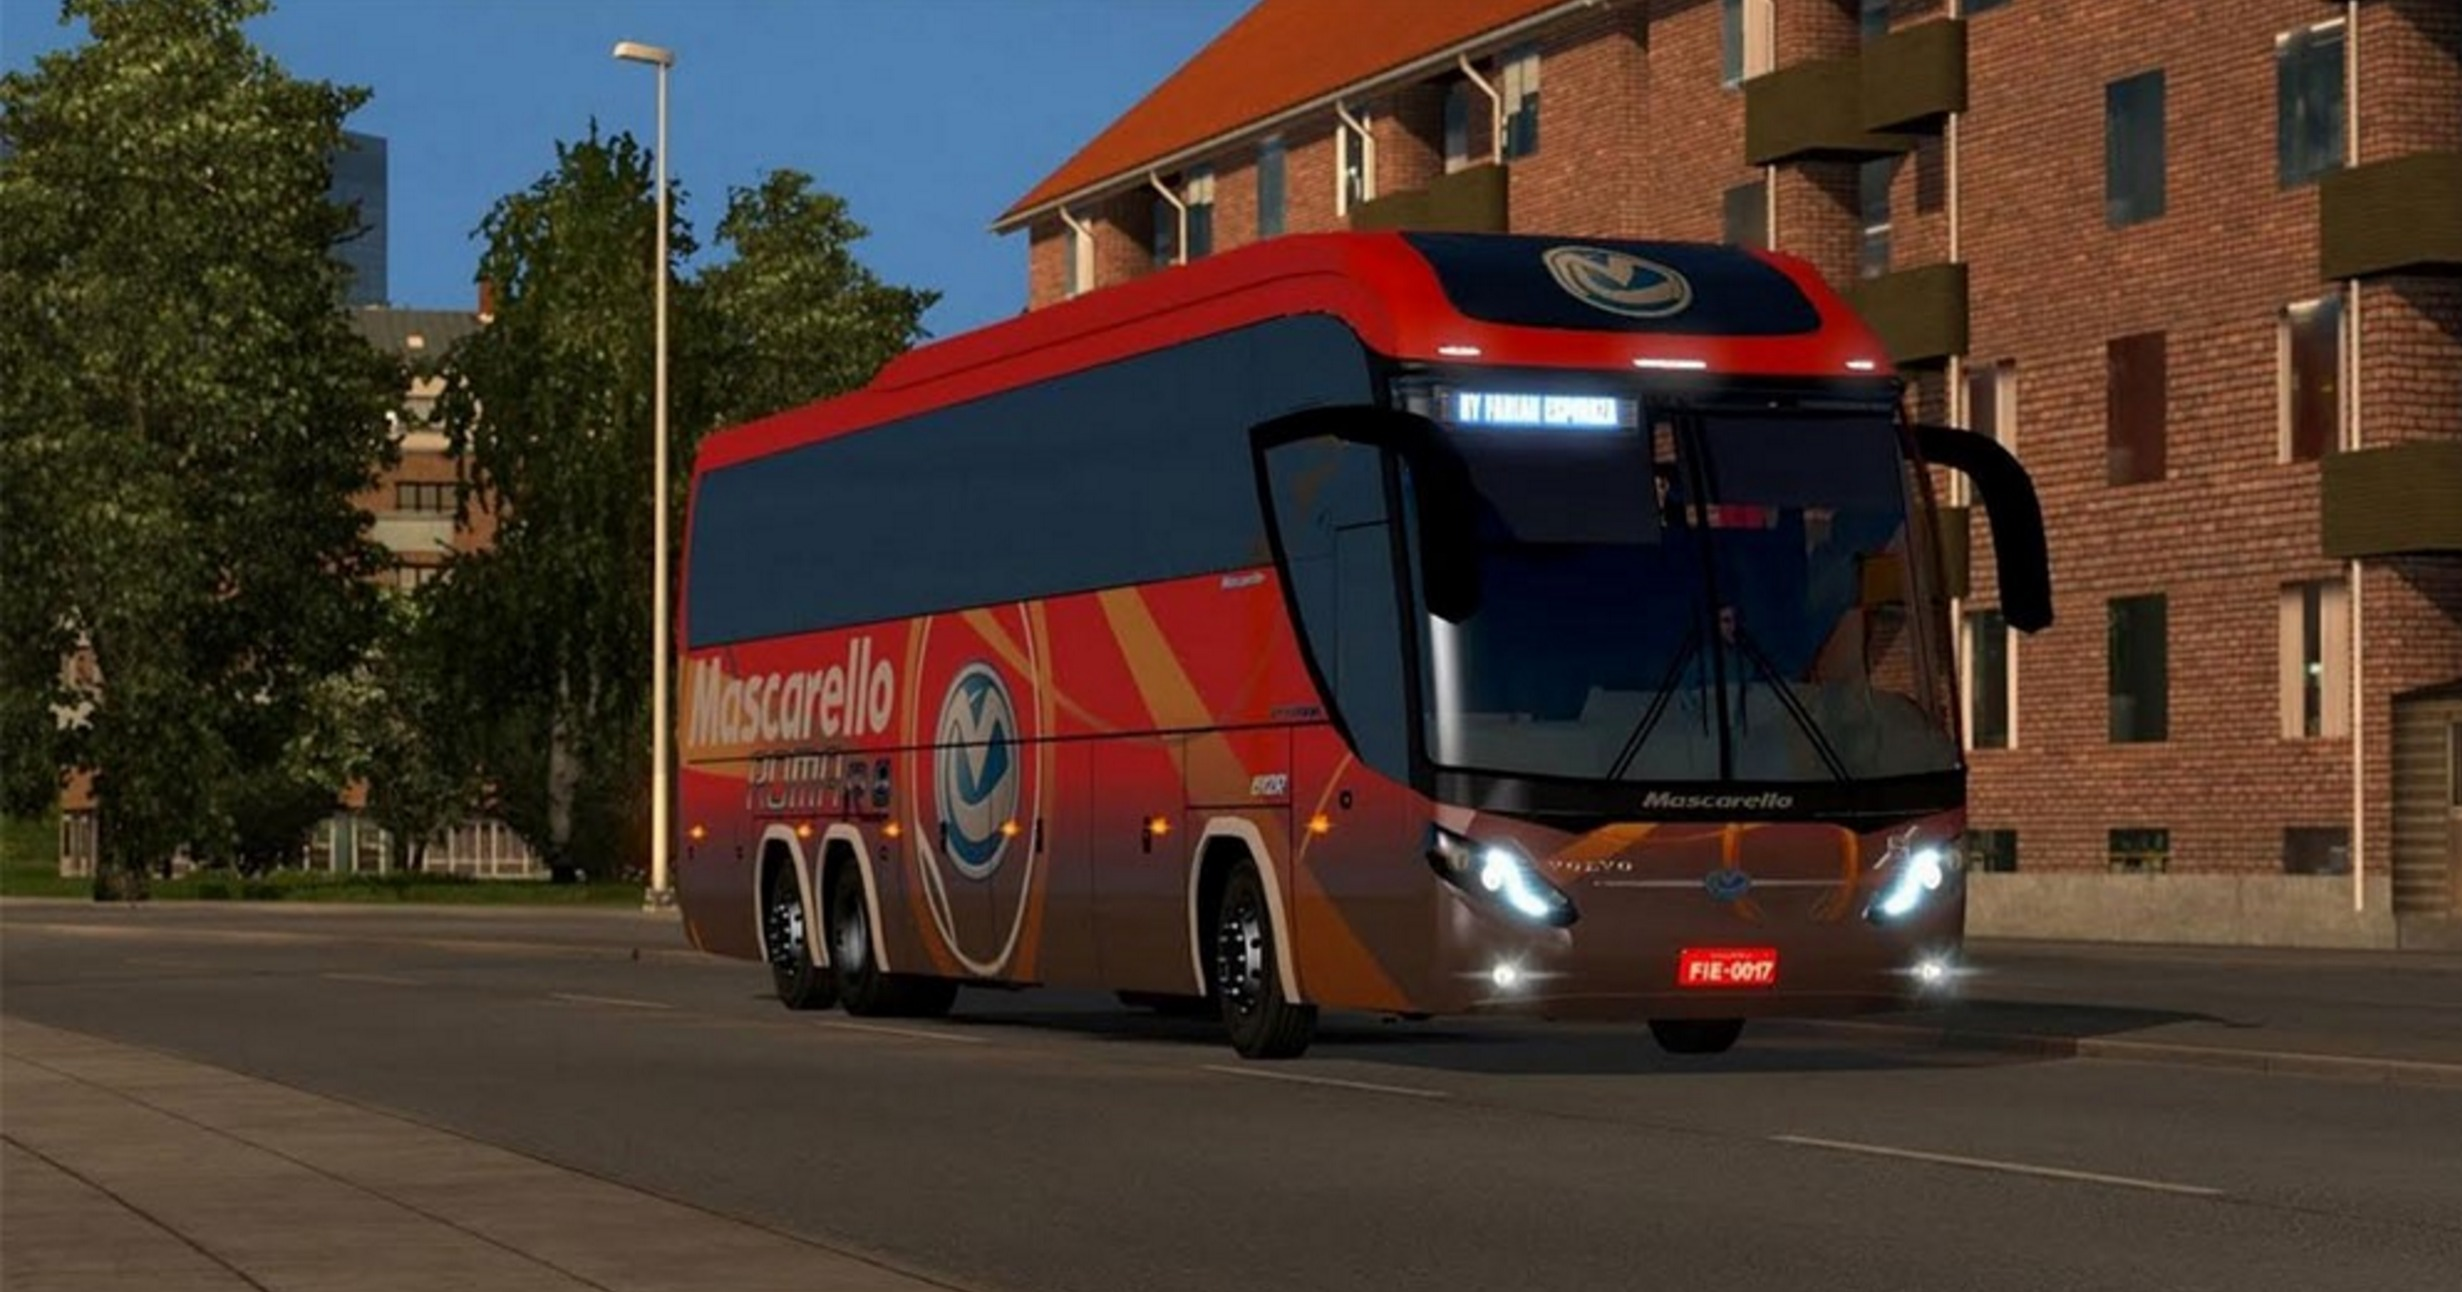 Mascarello-Roma-370-6×2-Bus.jpeg